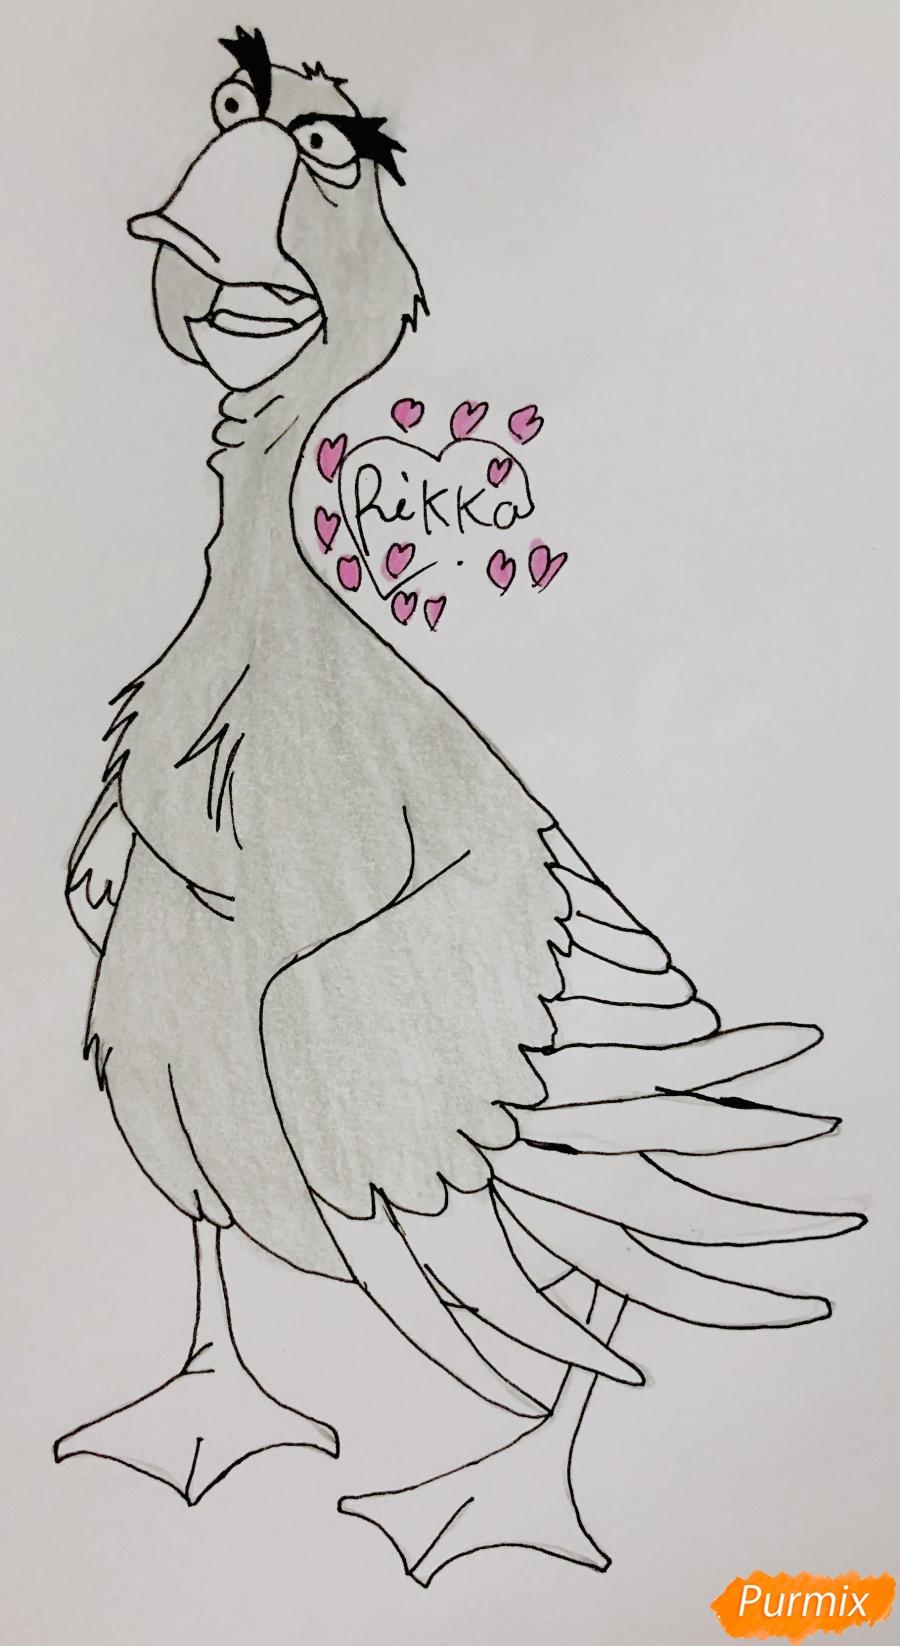 Рисуем гуся по имени Борис из мультфильма Балто карандашами - фото 5